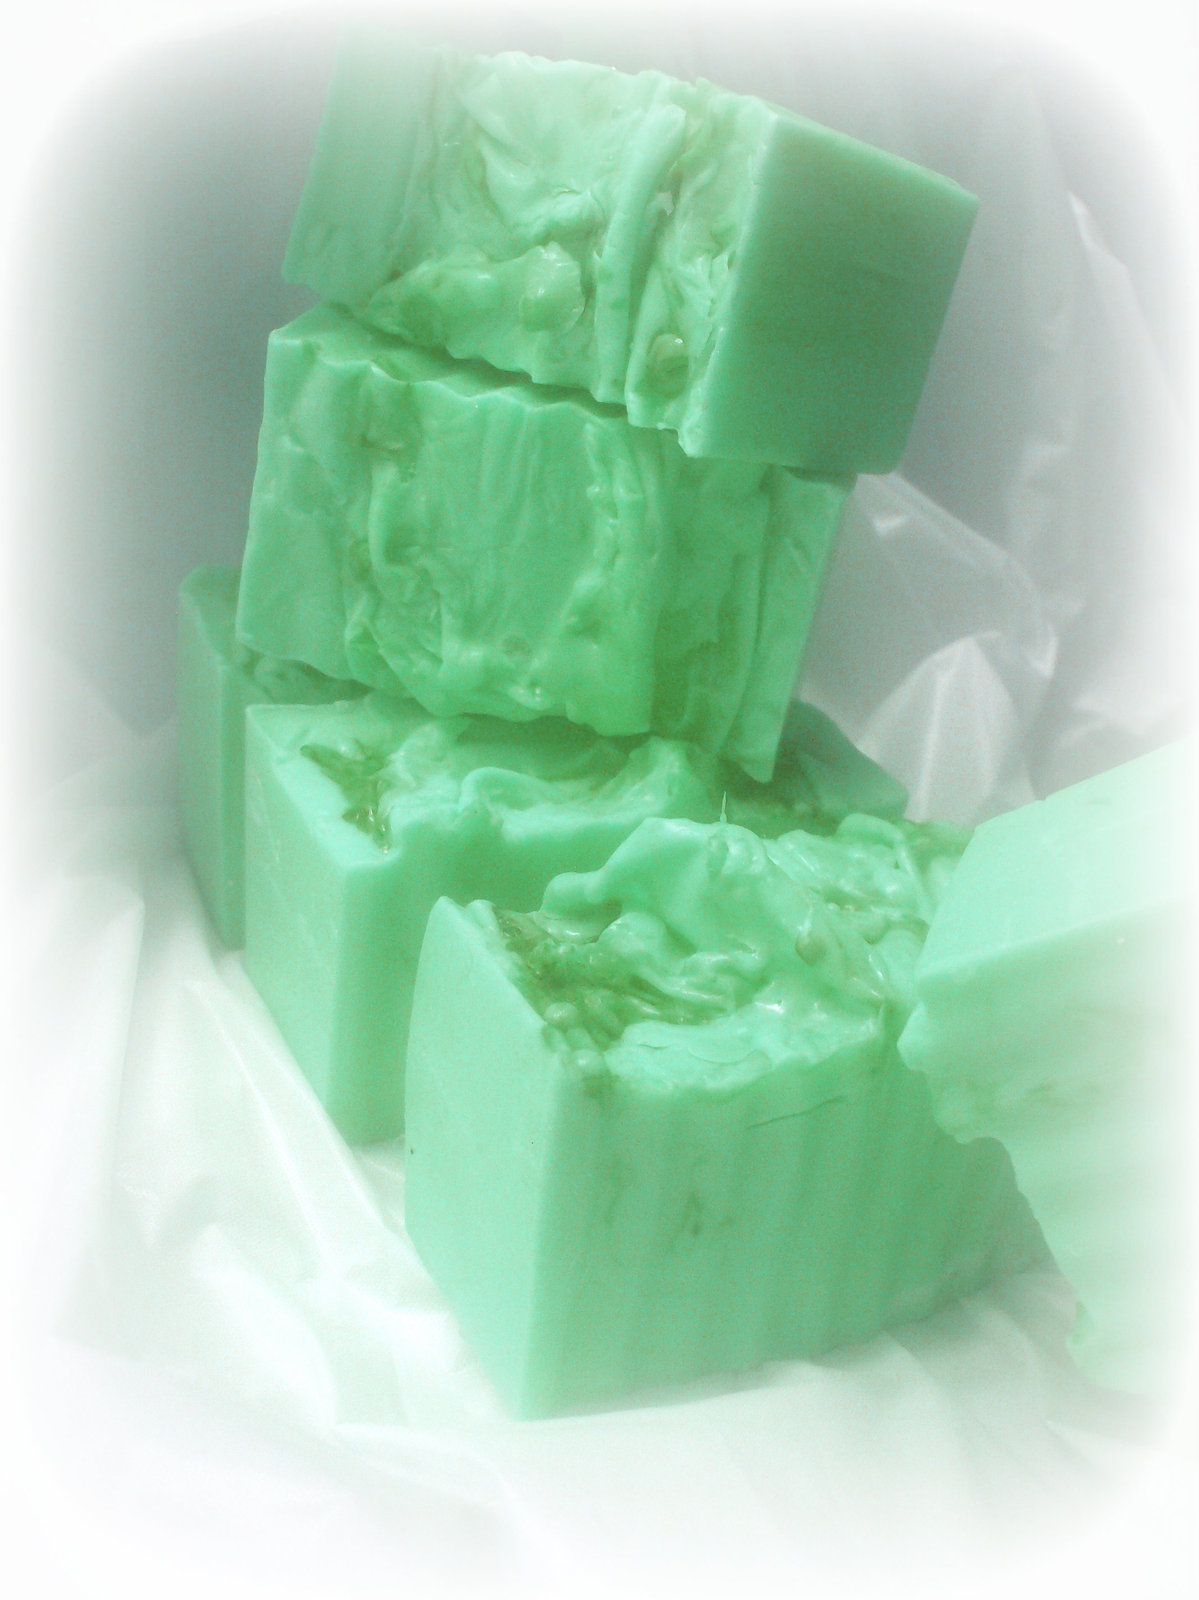 lemon and lime goats milk soap, lsoap, fruity soap, handmade soap, beauty, bath